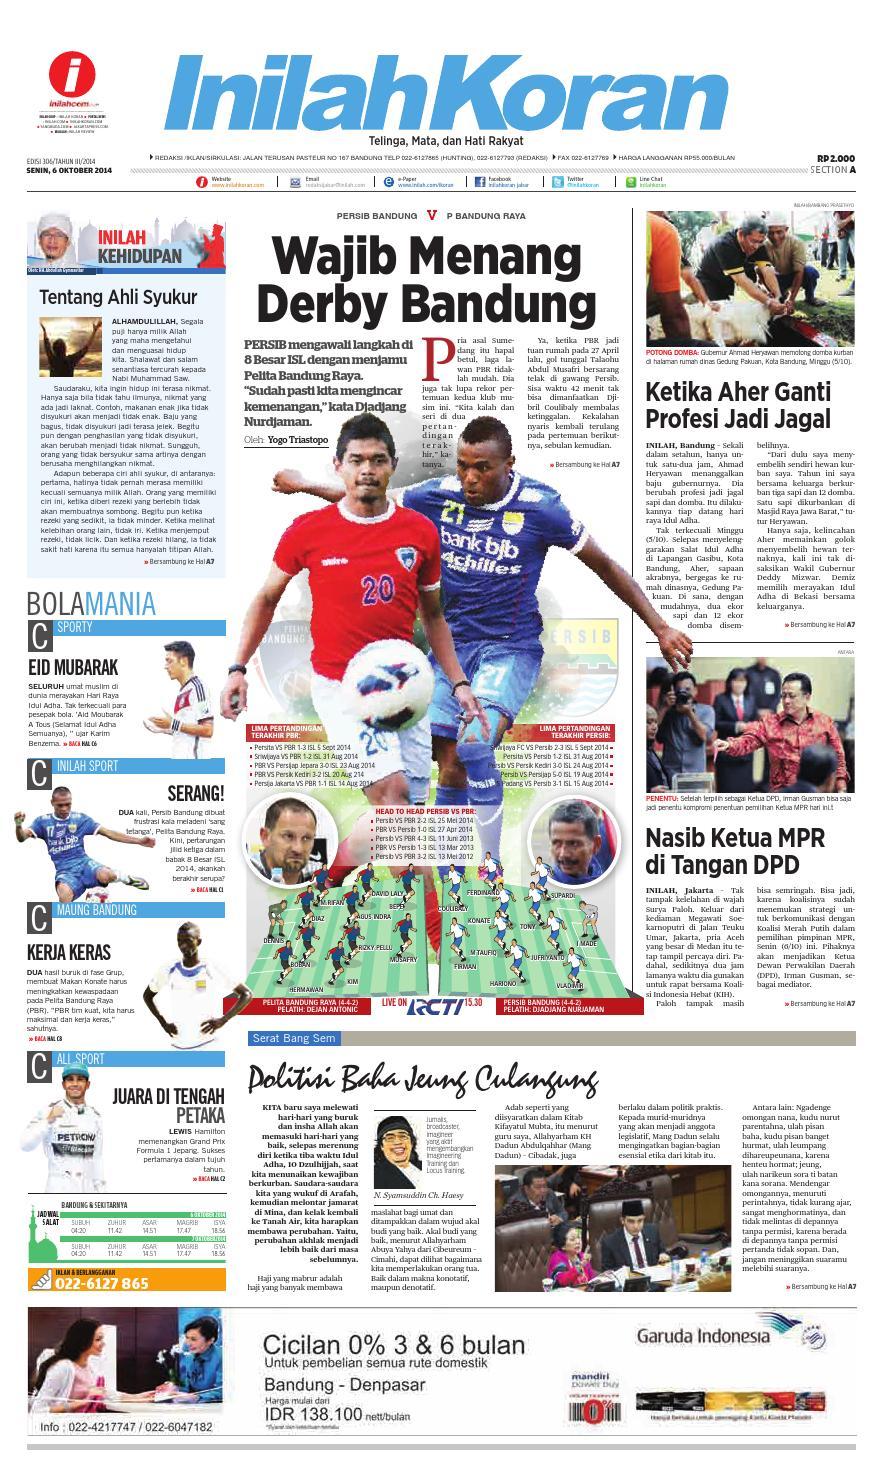 Wajib Menang Derby Bandung By Inilah Koran Issuu Produk Ukm Bumn Bahan Songket Sulam Katun Merah